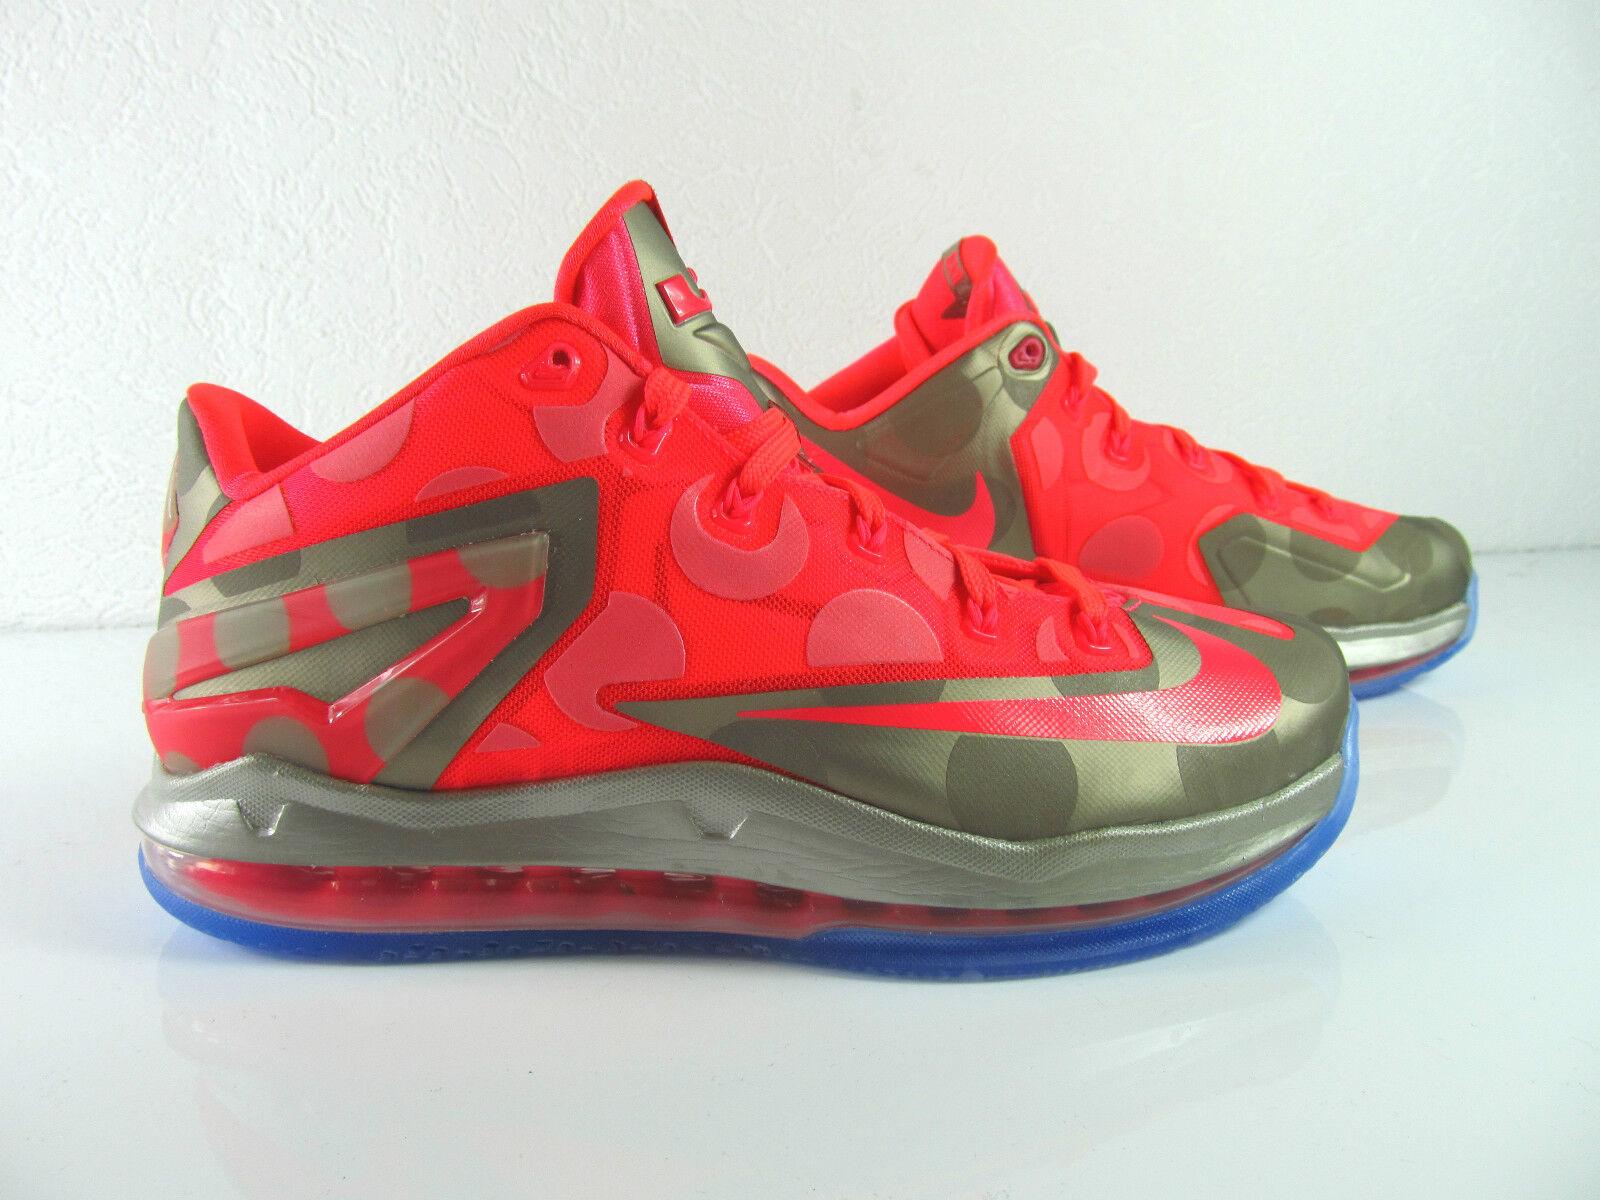 Nike Max Lebron XI 11 Low Maison Du Metallic Basketballschuhe US 8.5 10 Eu 42 44